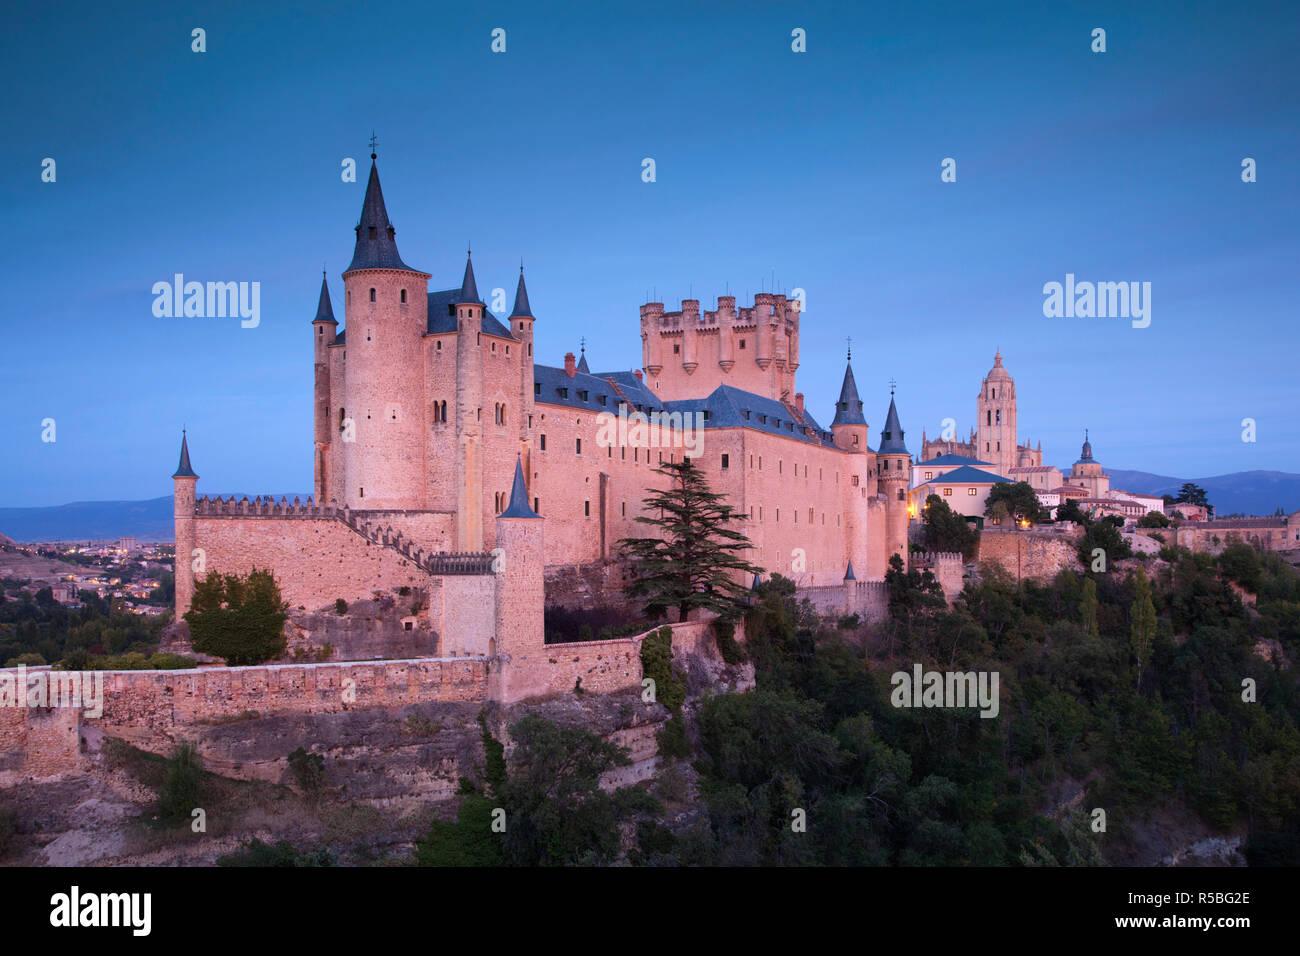 Spain, Castilla y Leon Region, Segovia Province, Segovia, The Alcazar, dusk - Stock Image